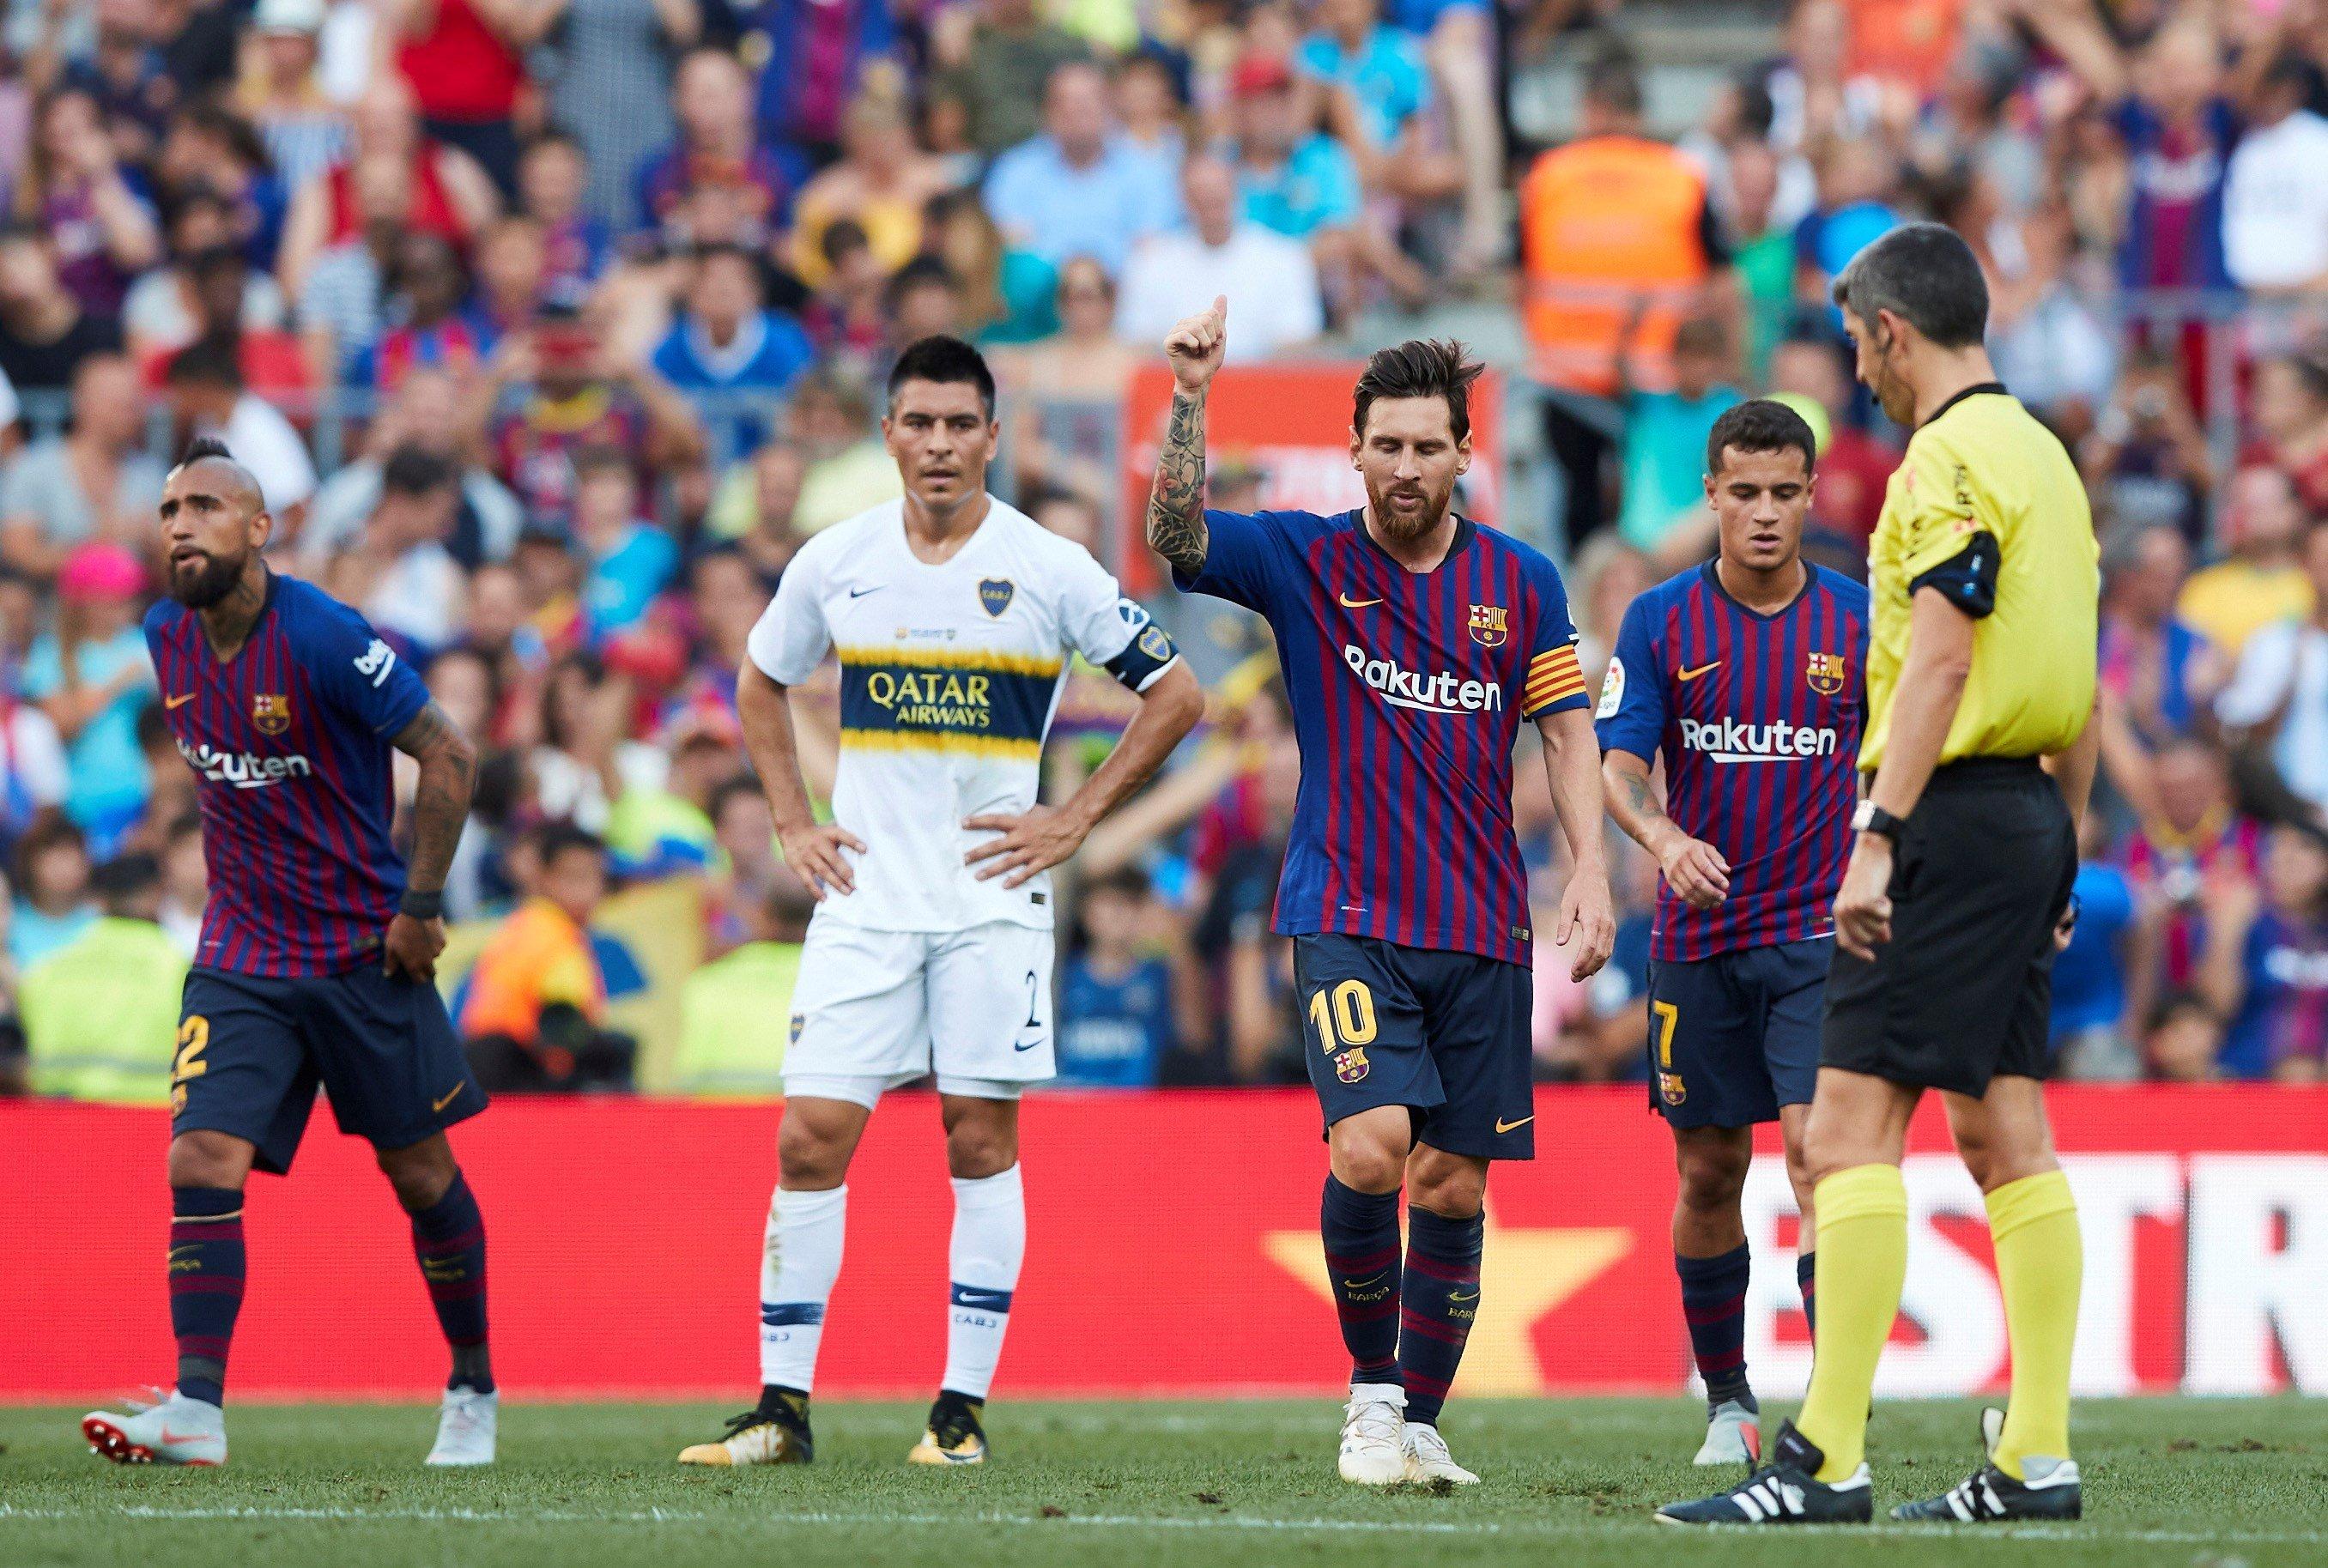 Barça shines in the Gamper (3-0)